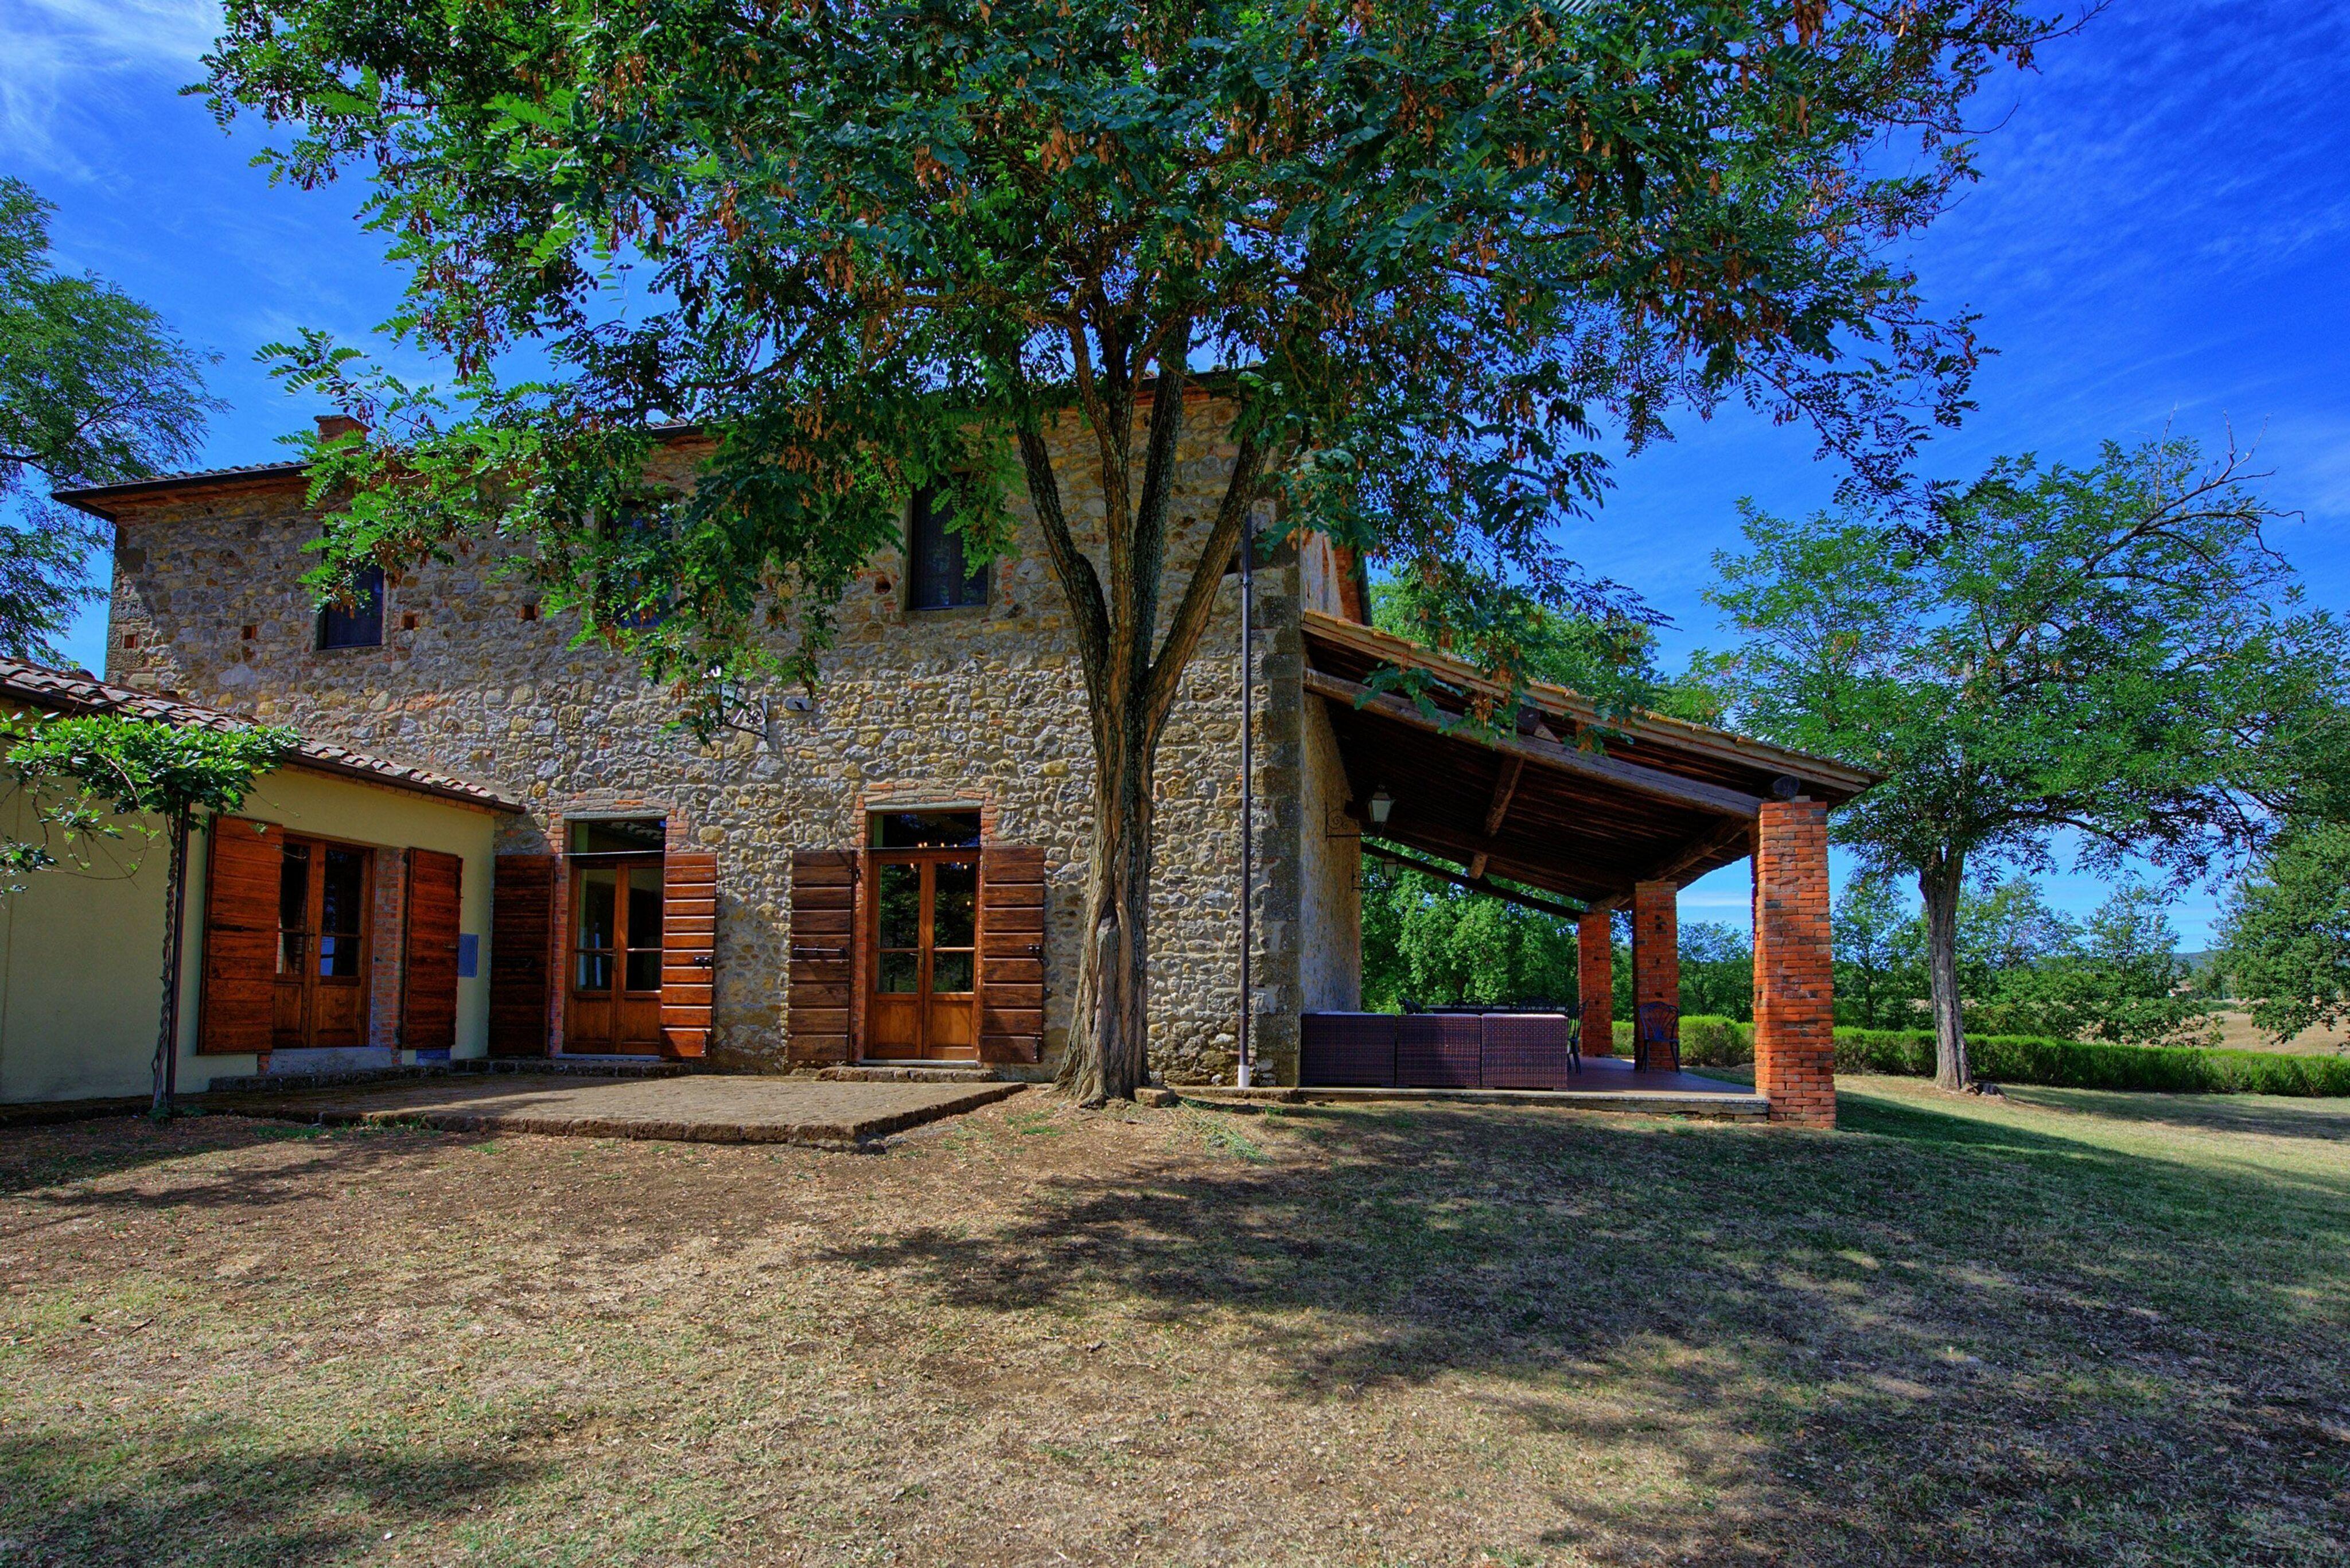 Villa Fabbriimage 41